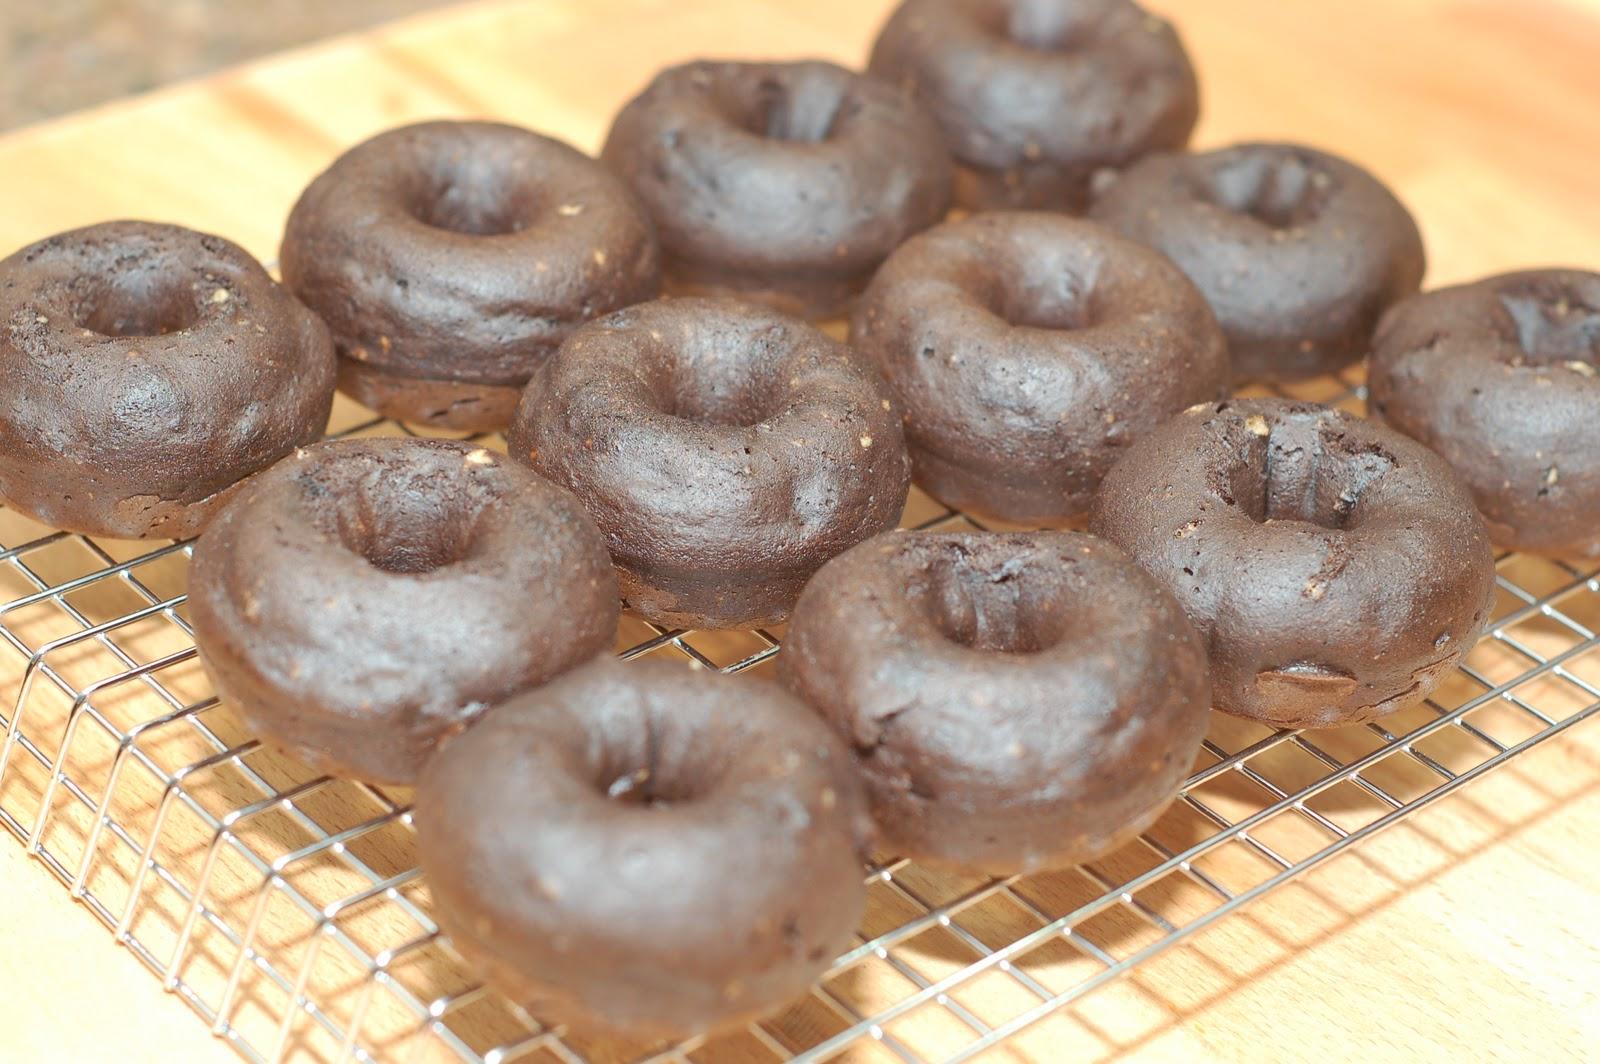 Peanut Butter Glaze For Chocolate Bundt Cake